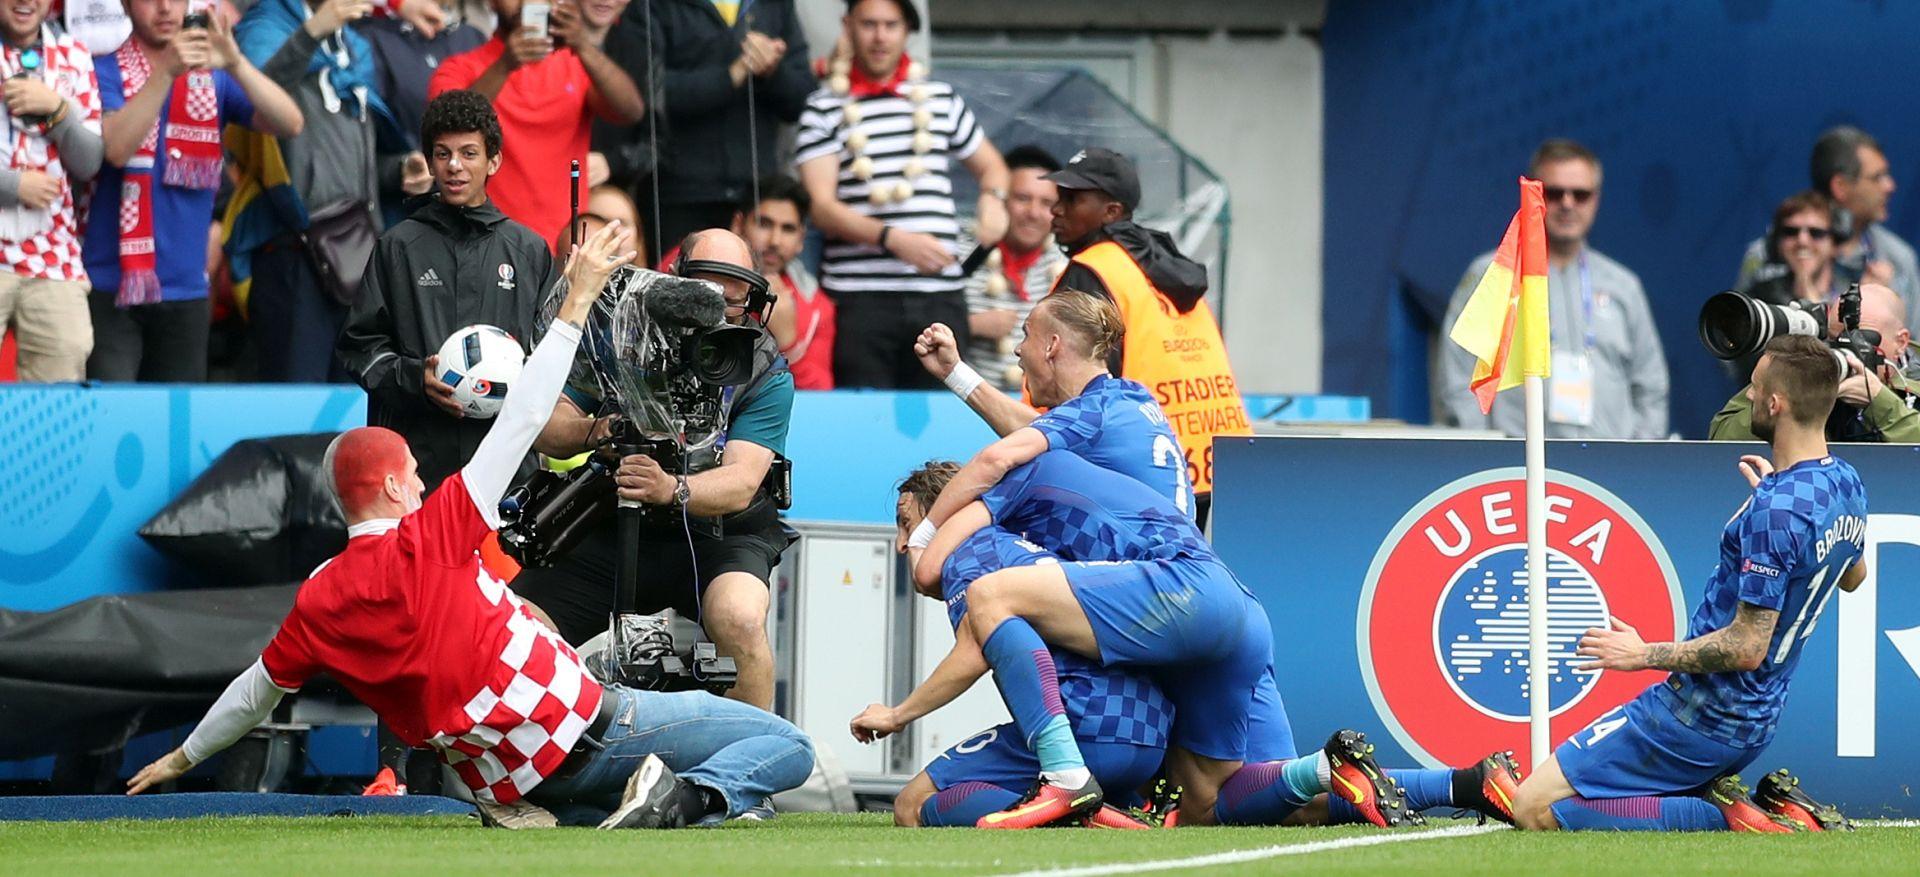 UEFA Otvoren disciplinski postupak protiv Hrvatske zbog ulaska navijača na teren i pirotehnike